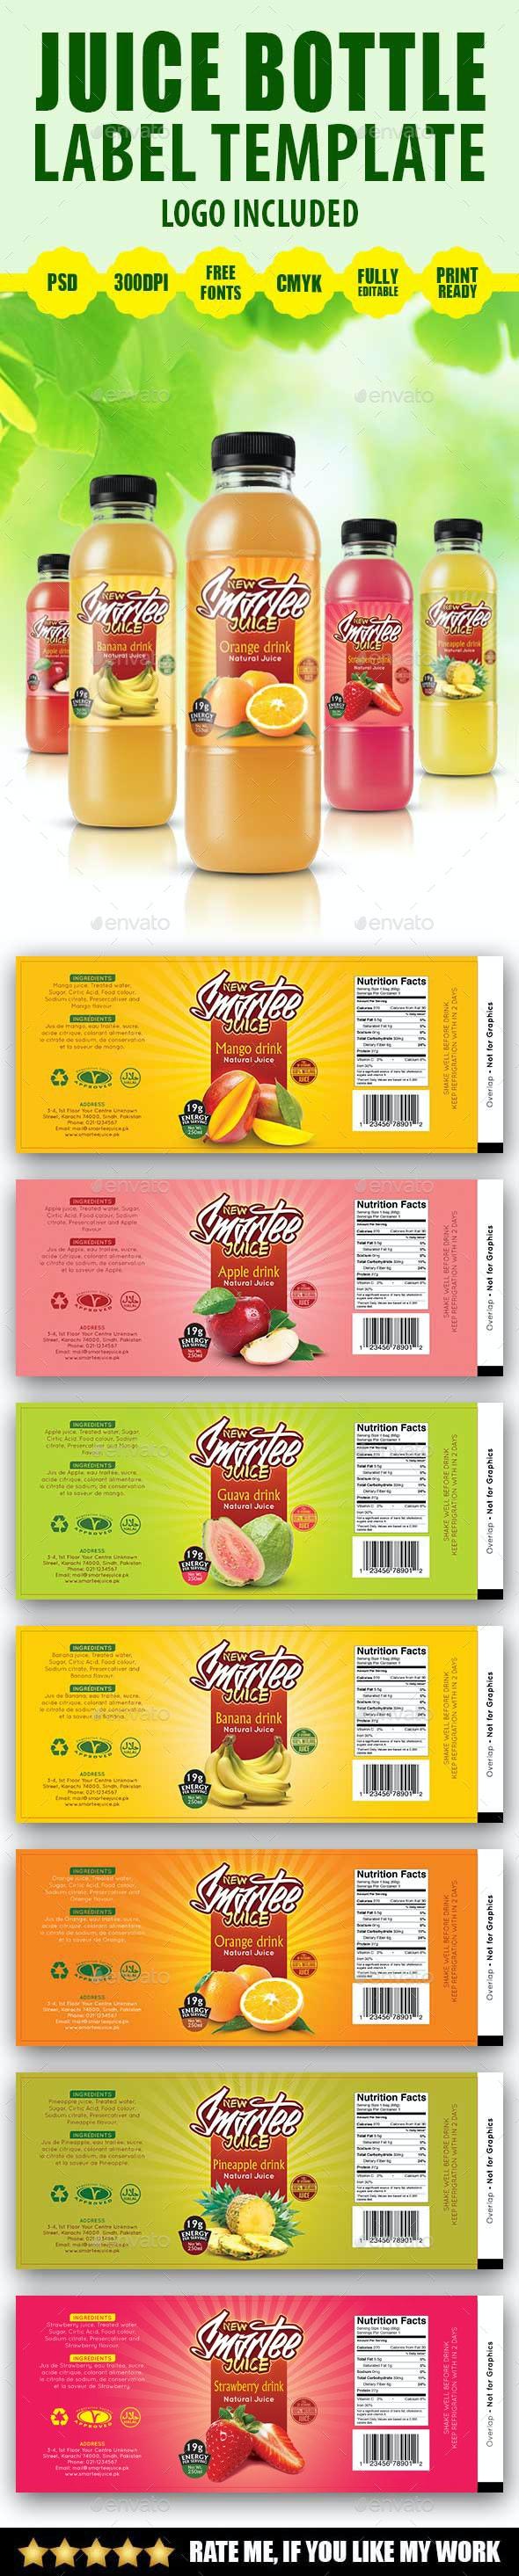 Juice Bottle Label Template V2 - Print Templates